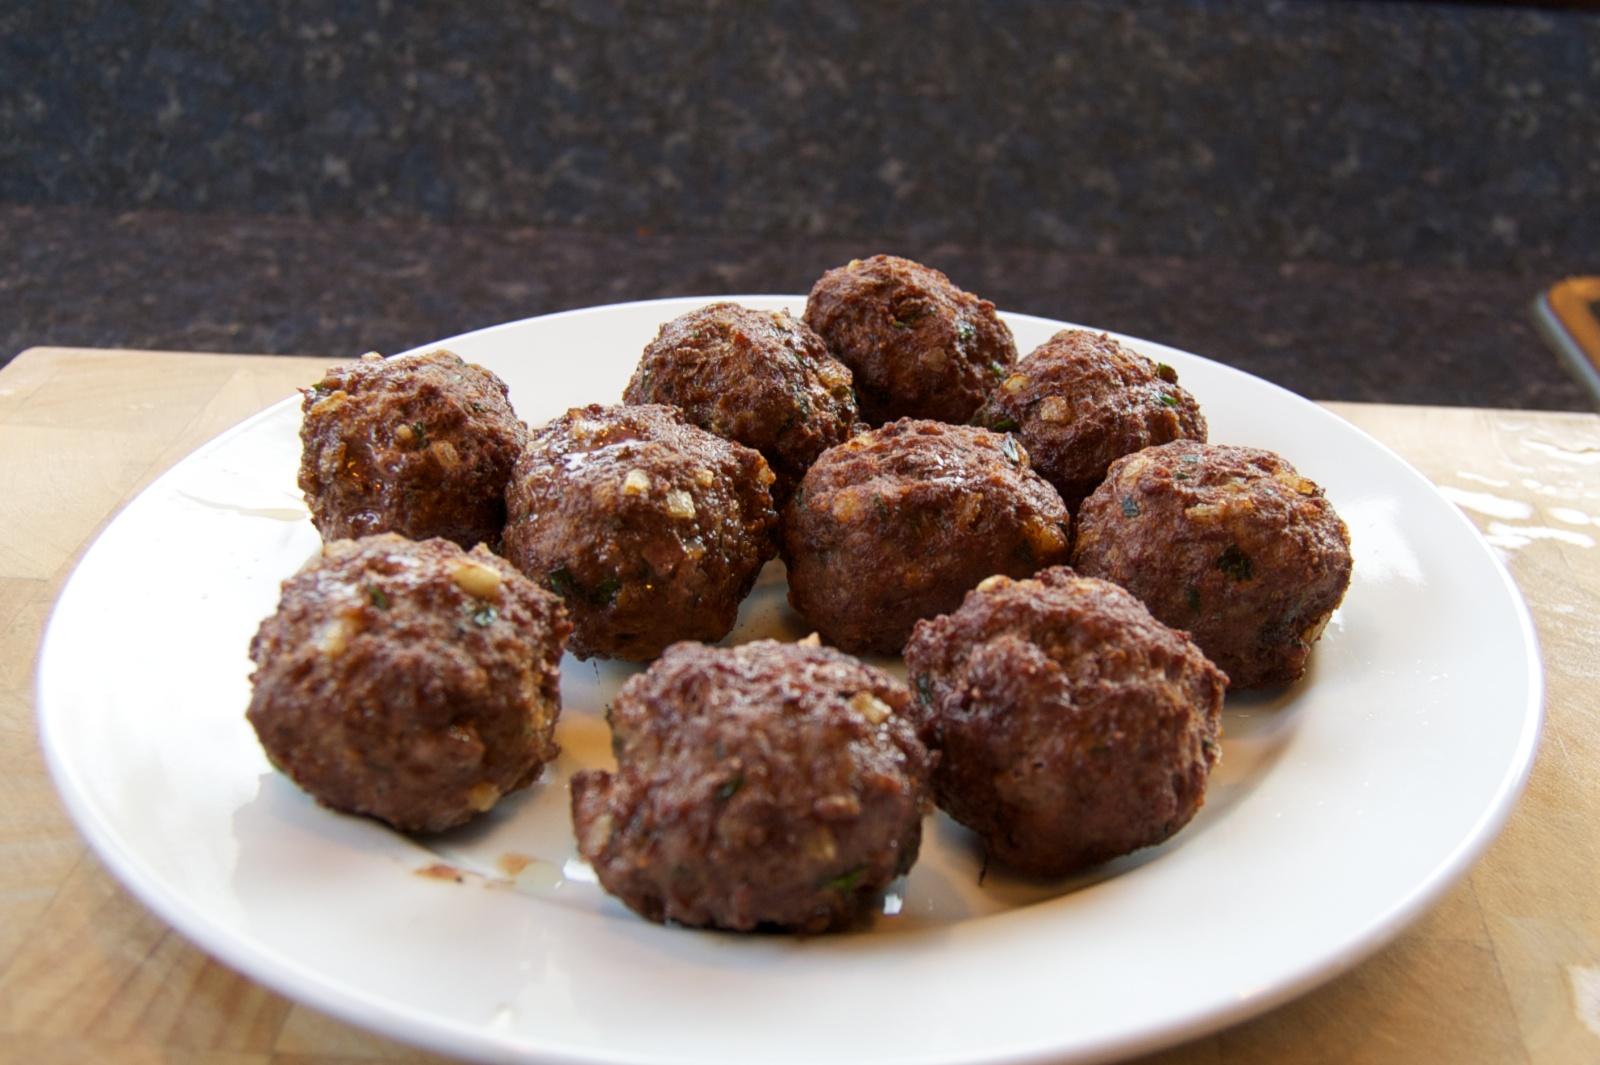 http://blog.rickk.com/food/2012/10/12/ate.2012.10.12.c3.jpg